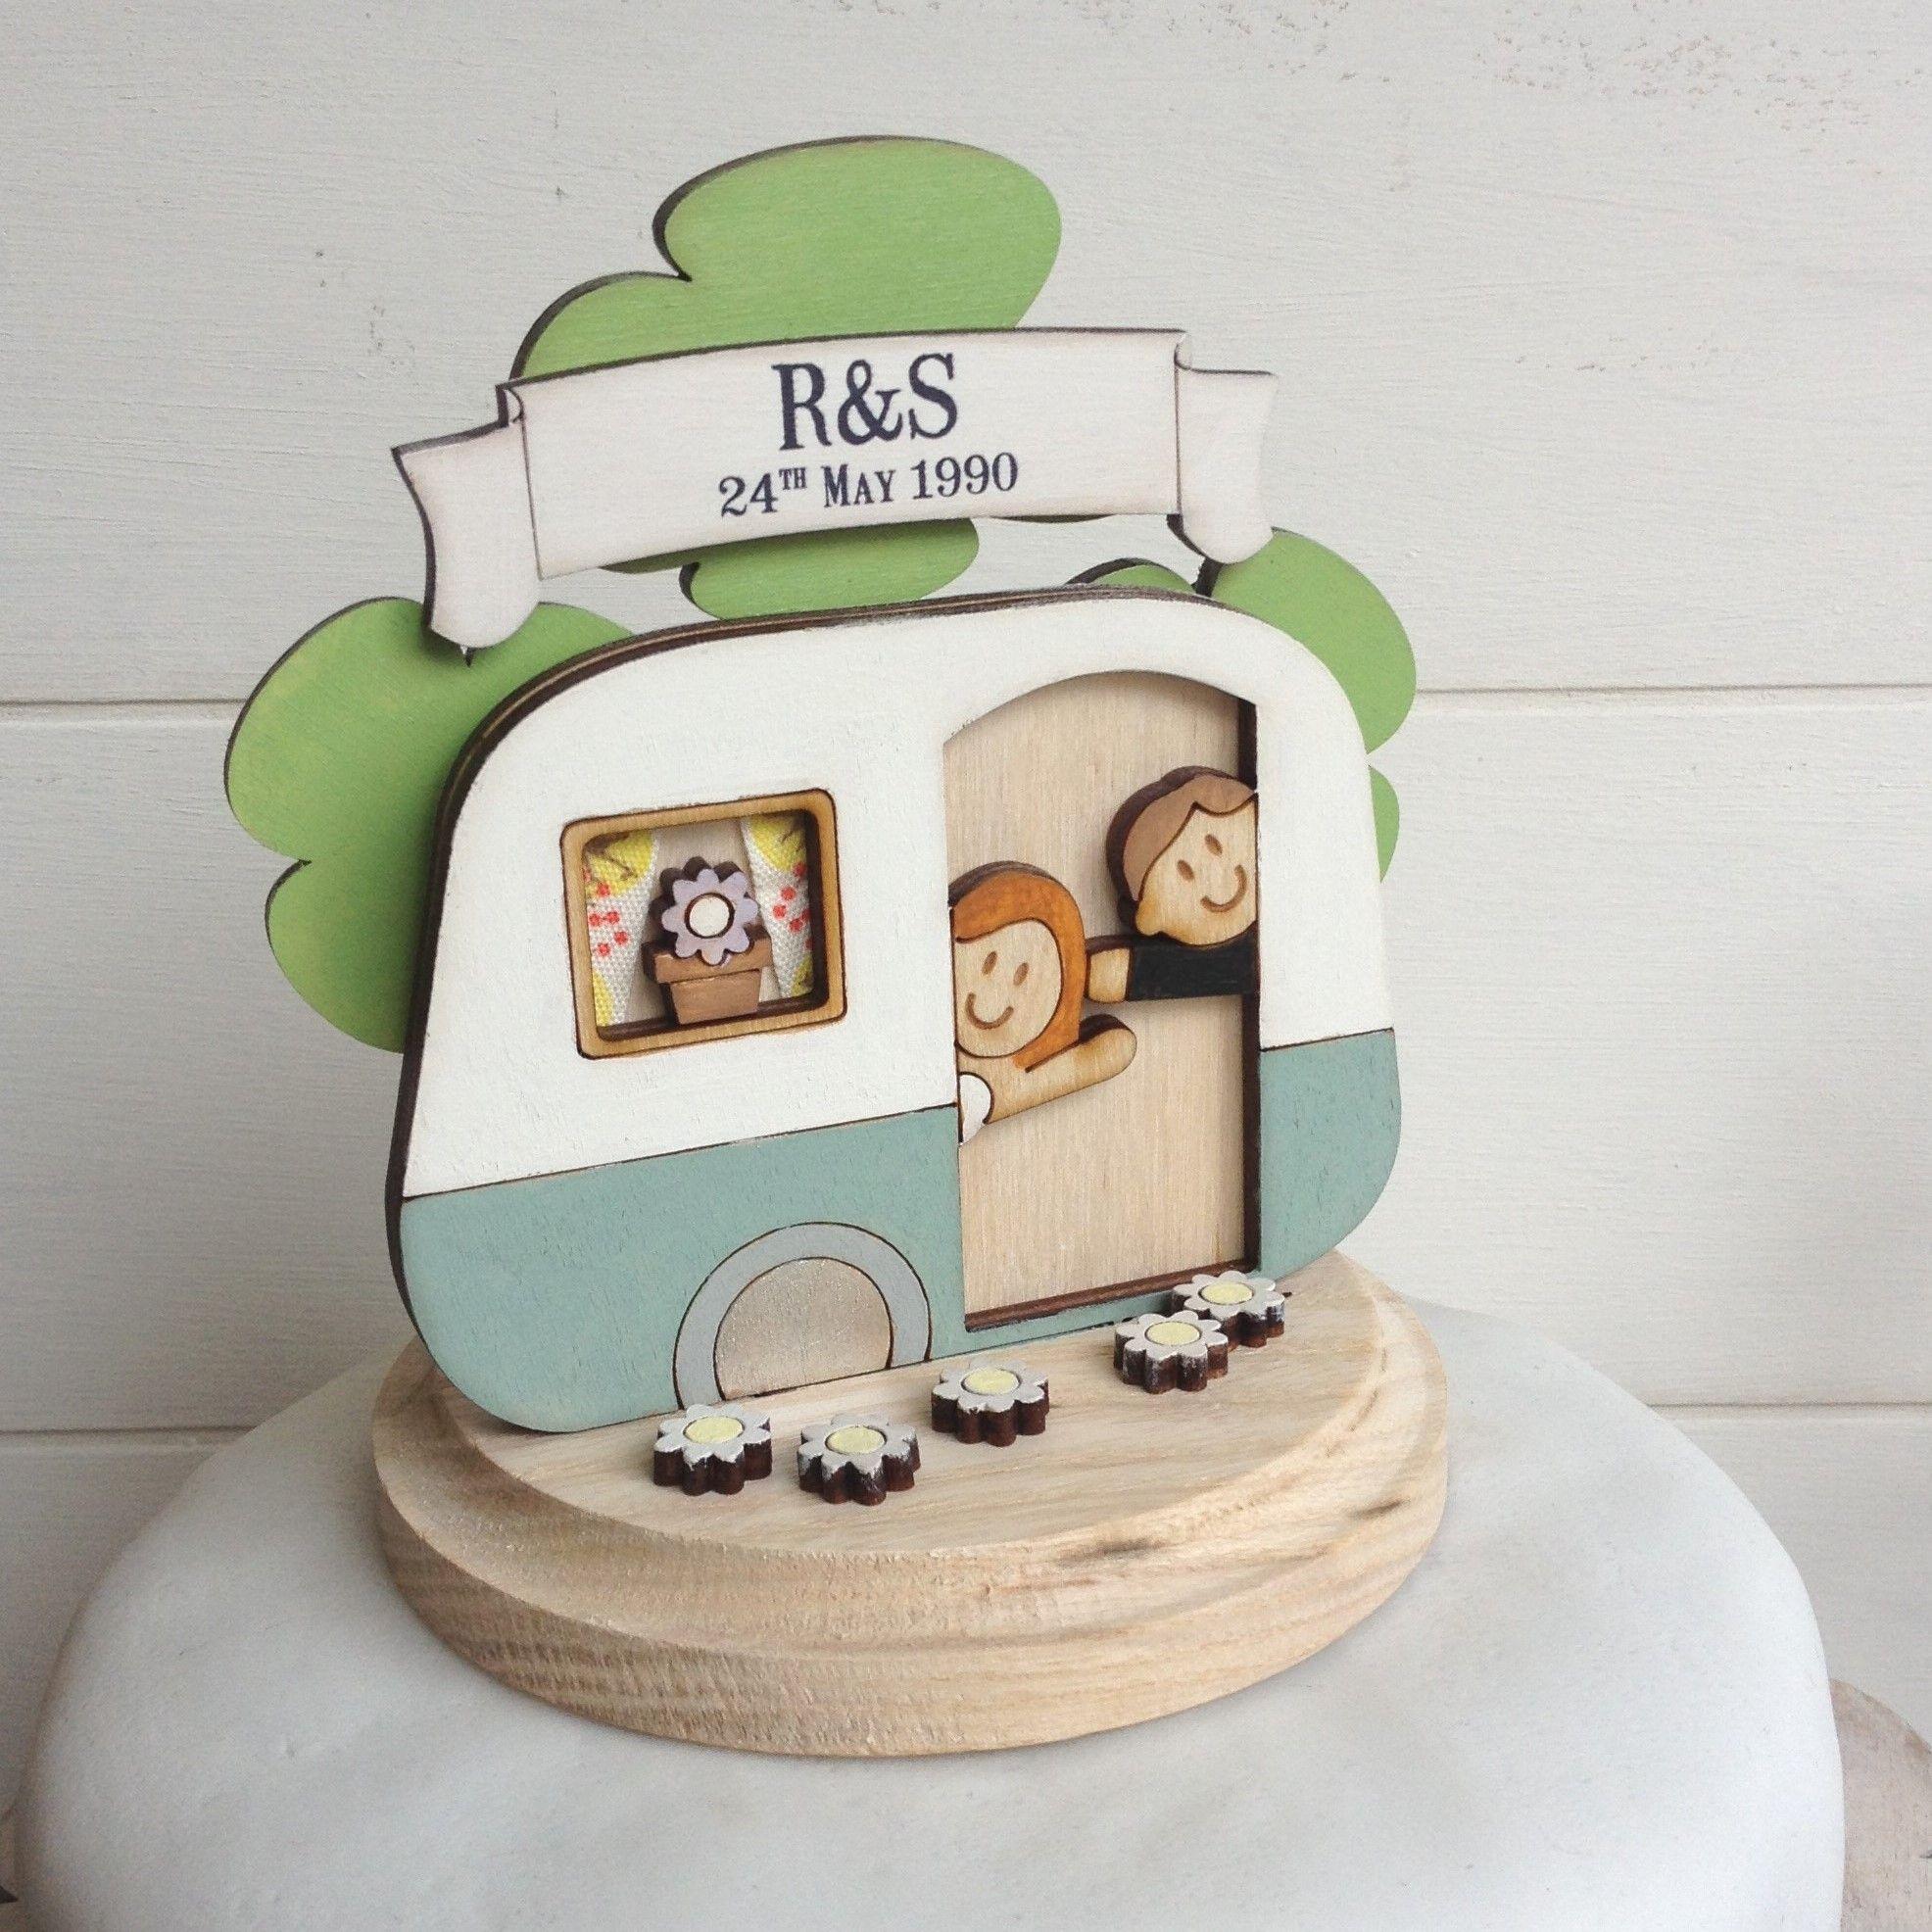 How To Make A Caravan Cake Topper | Cake Recipe